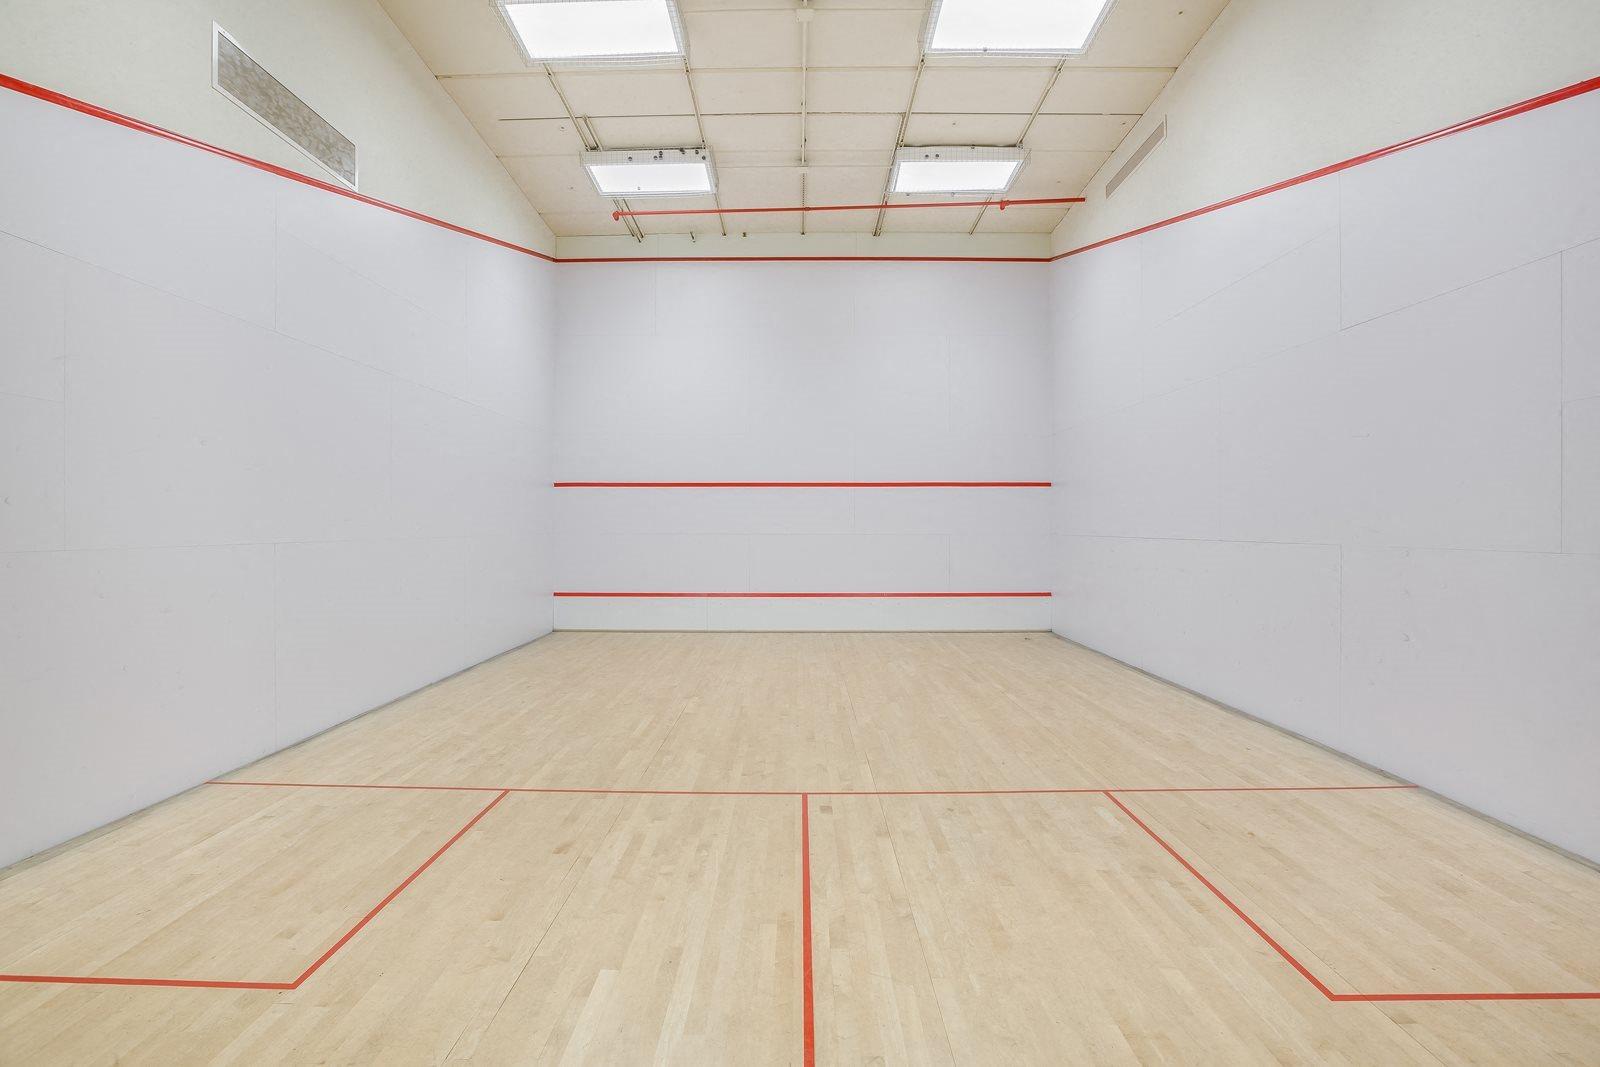 Squash court at The Ashley Apartments, New York, New York